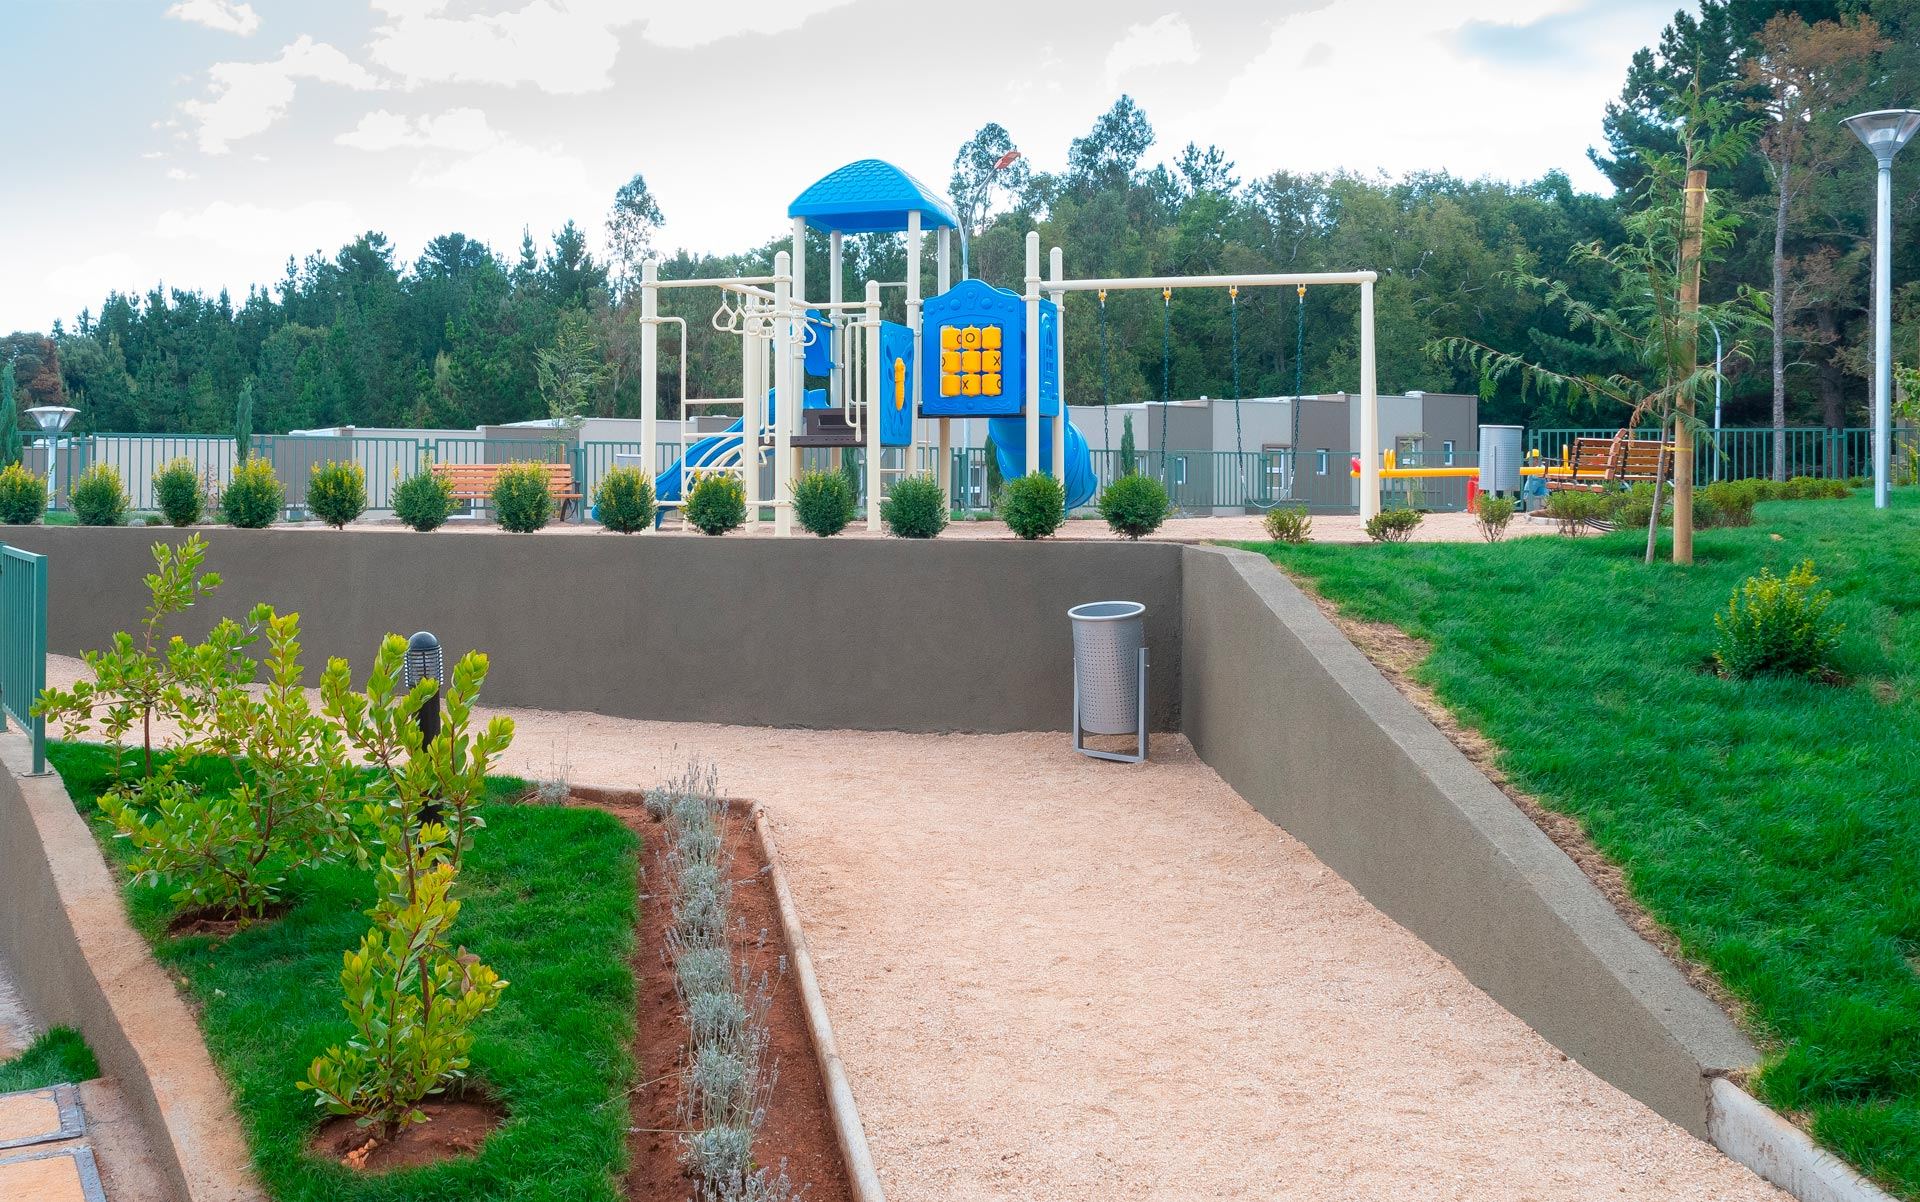 parque infantil plaza parque los poetas